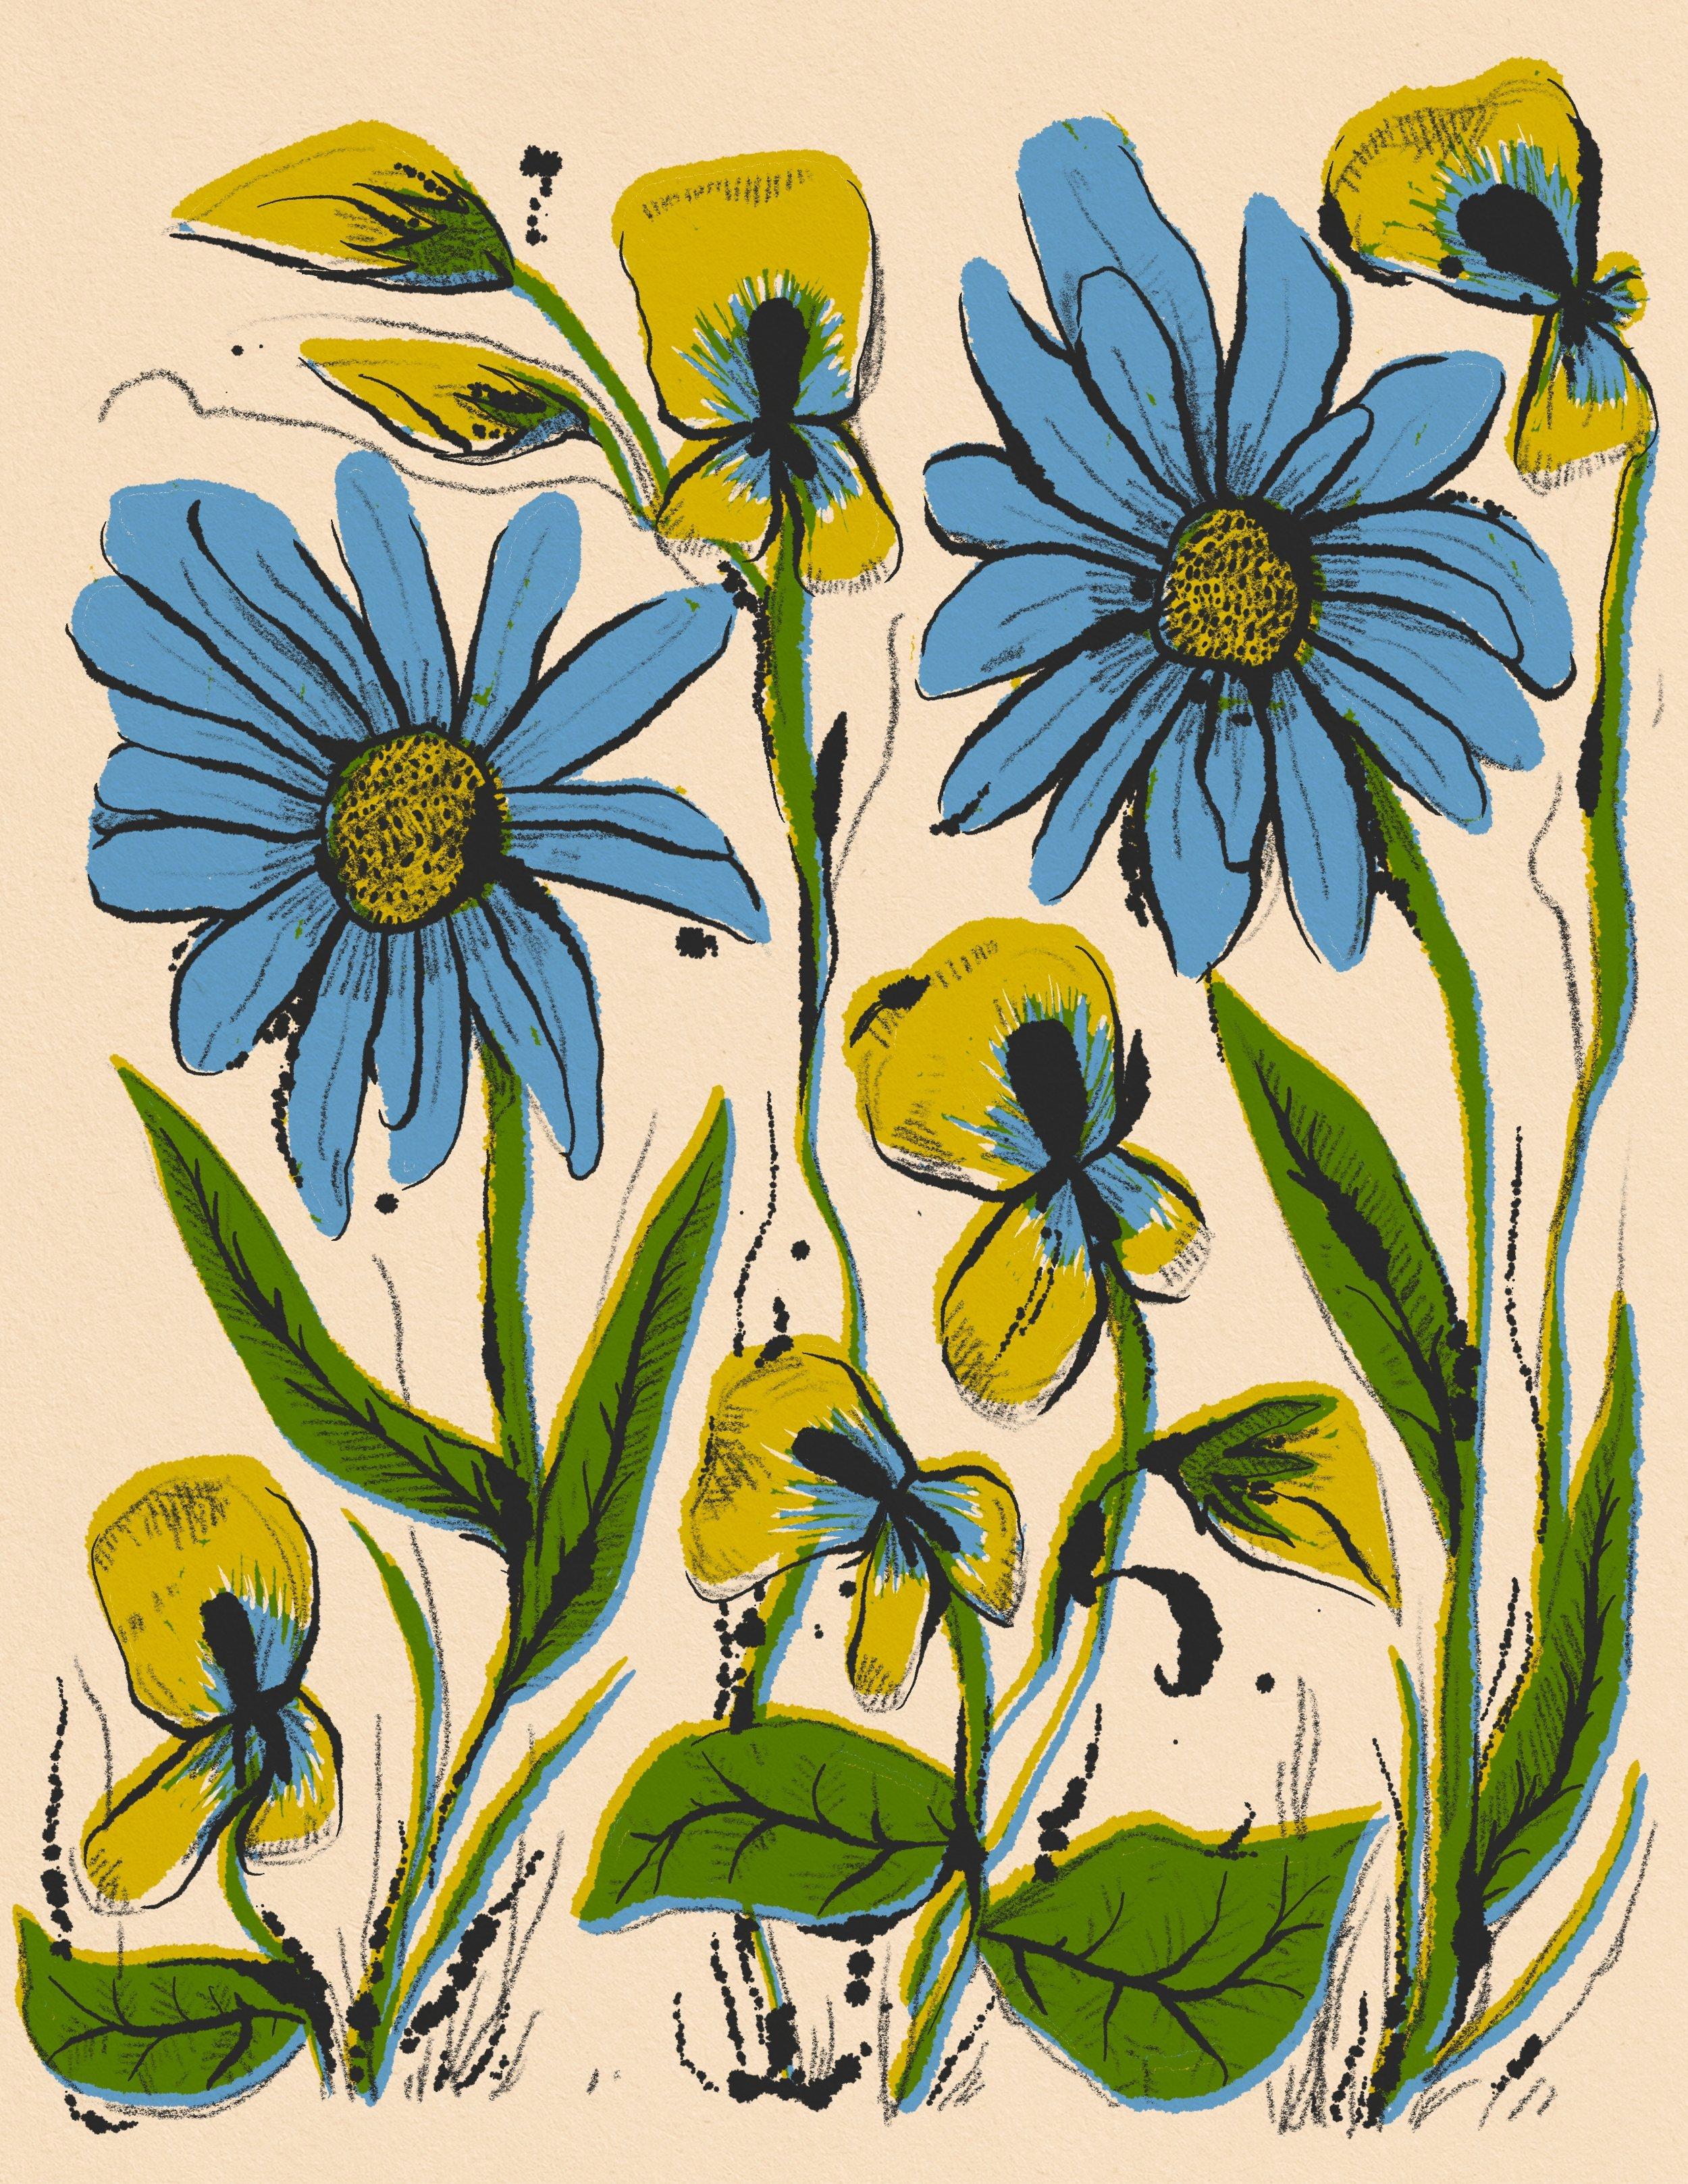 190901_flowers_Mallory Cohn.JPG